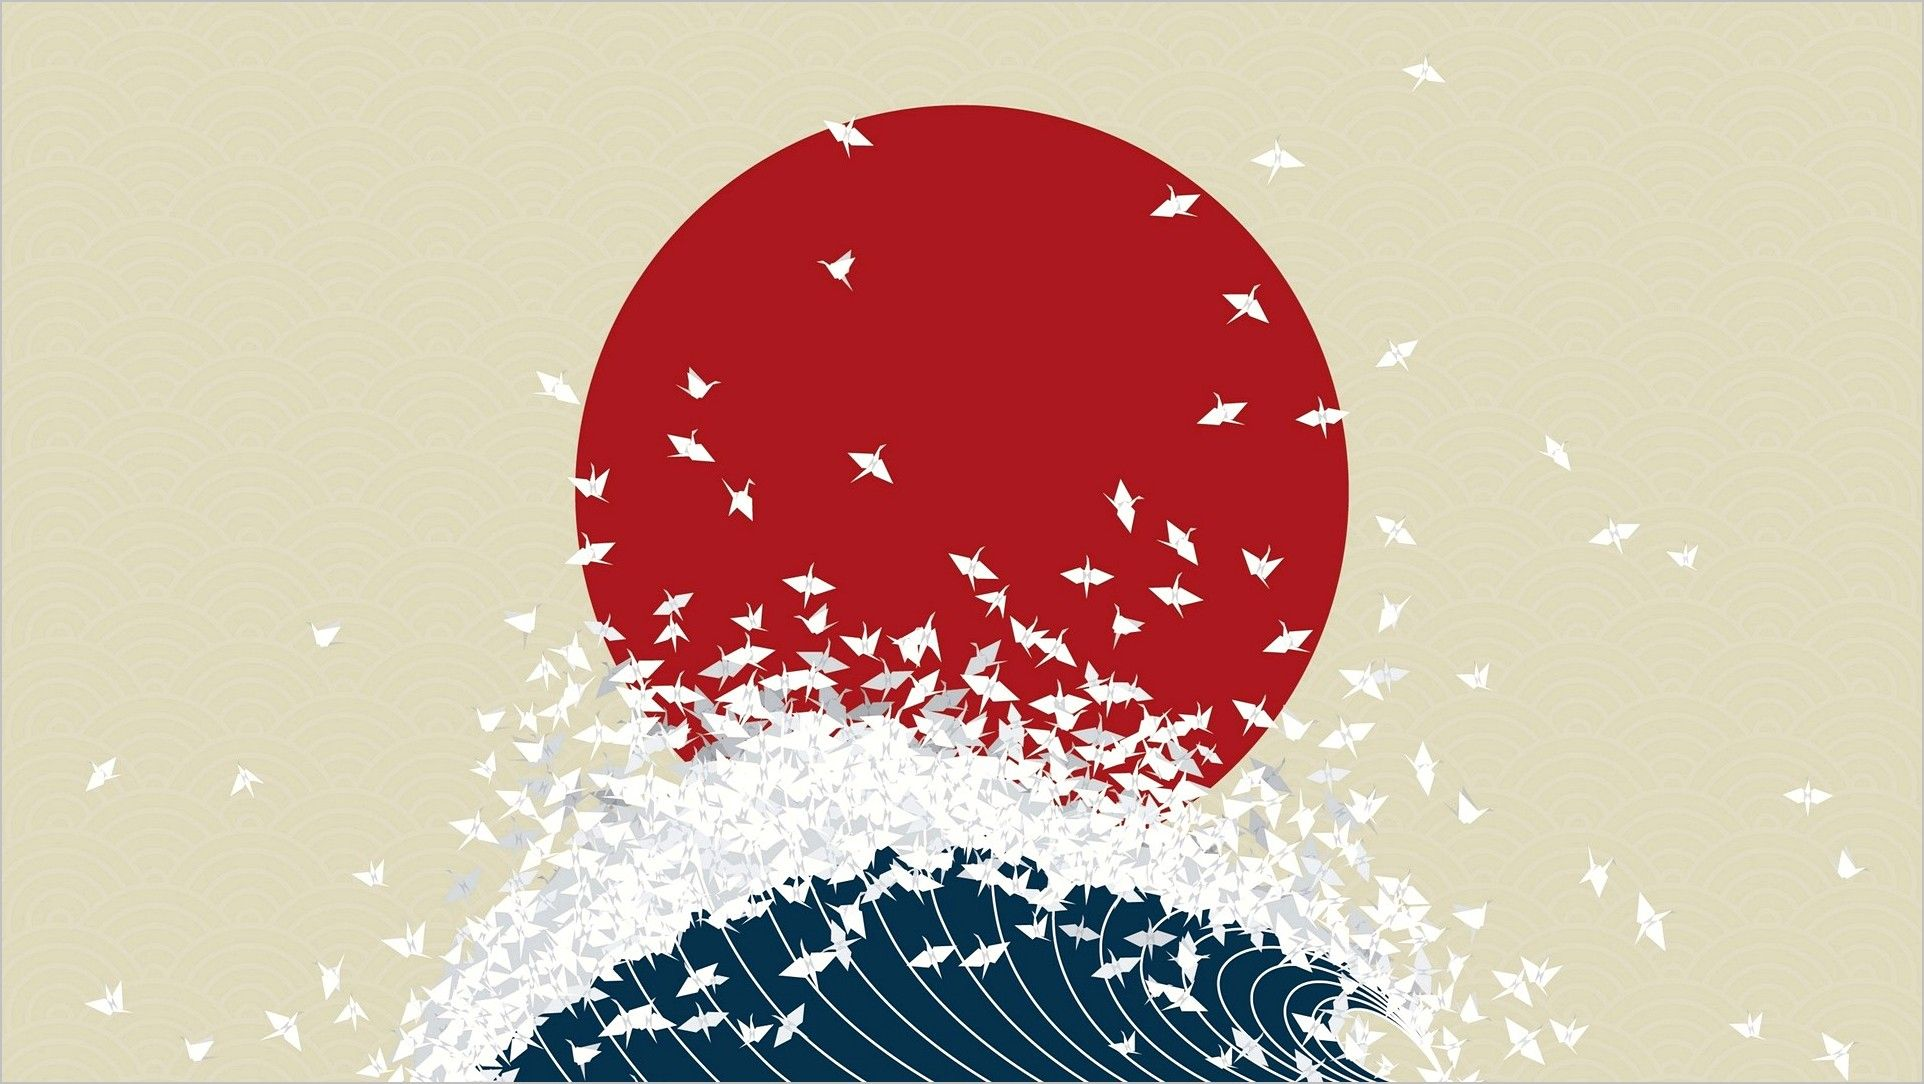 Japanese Minimalist Wallpaper 4k In 2020 Japanese Art Minimalist Wallpaper Art Wallpaper